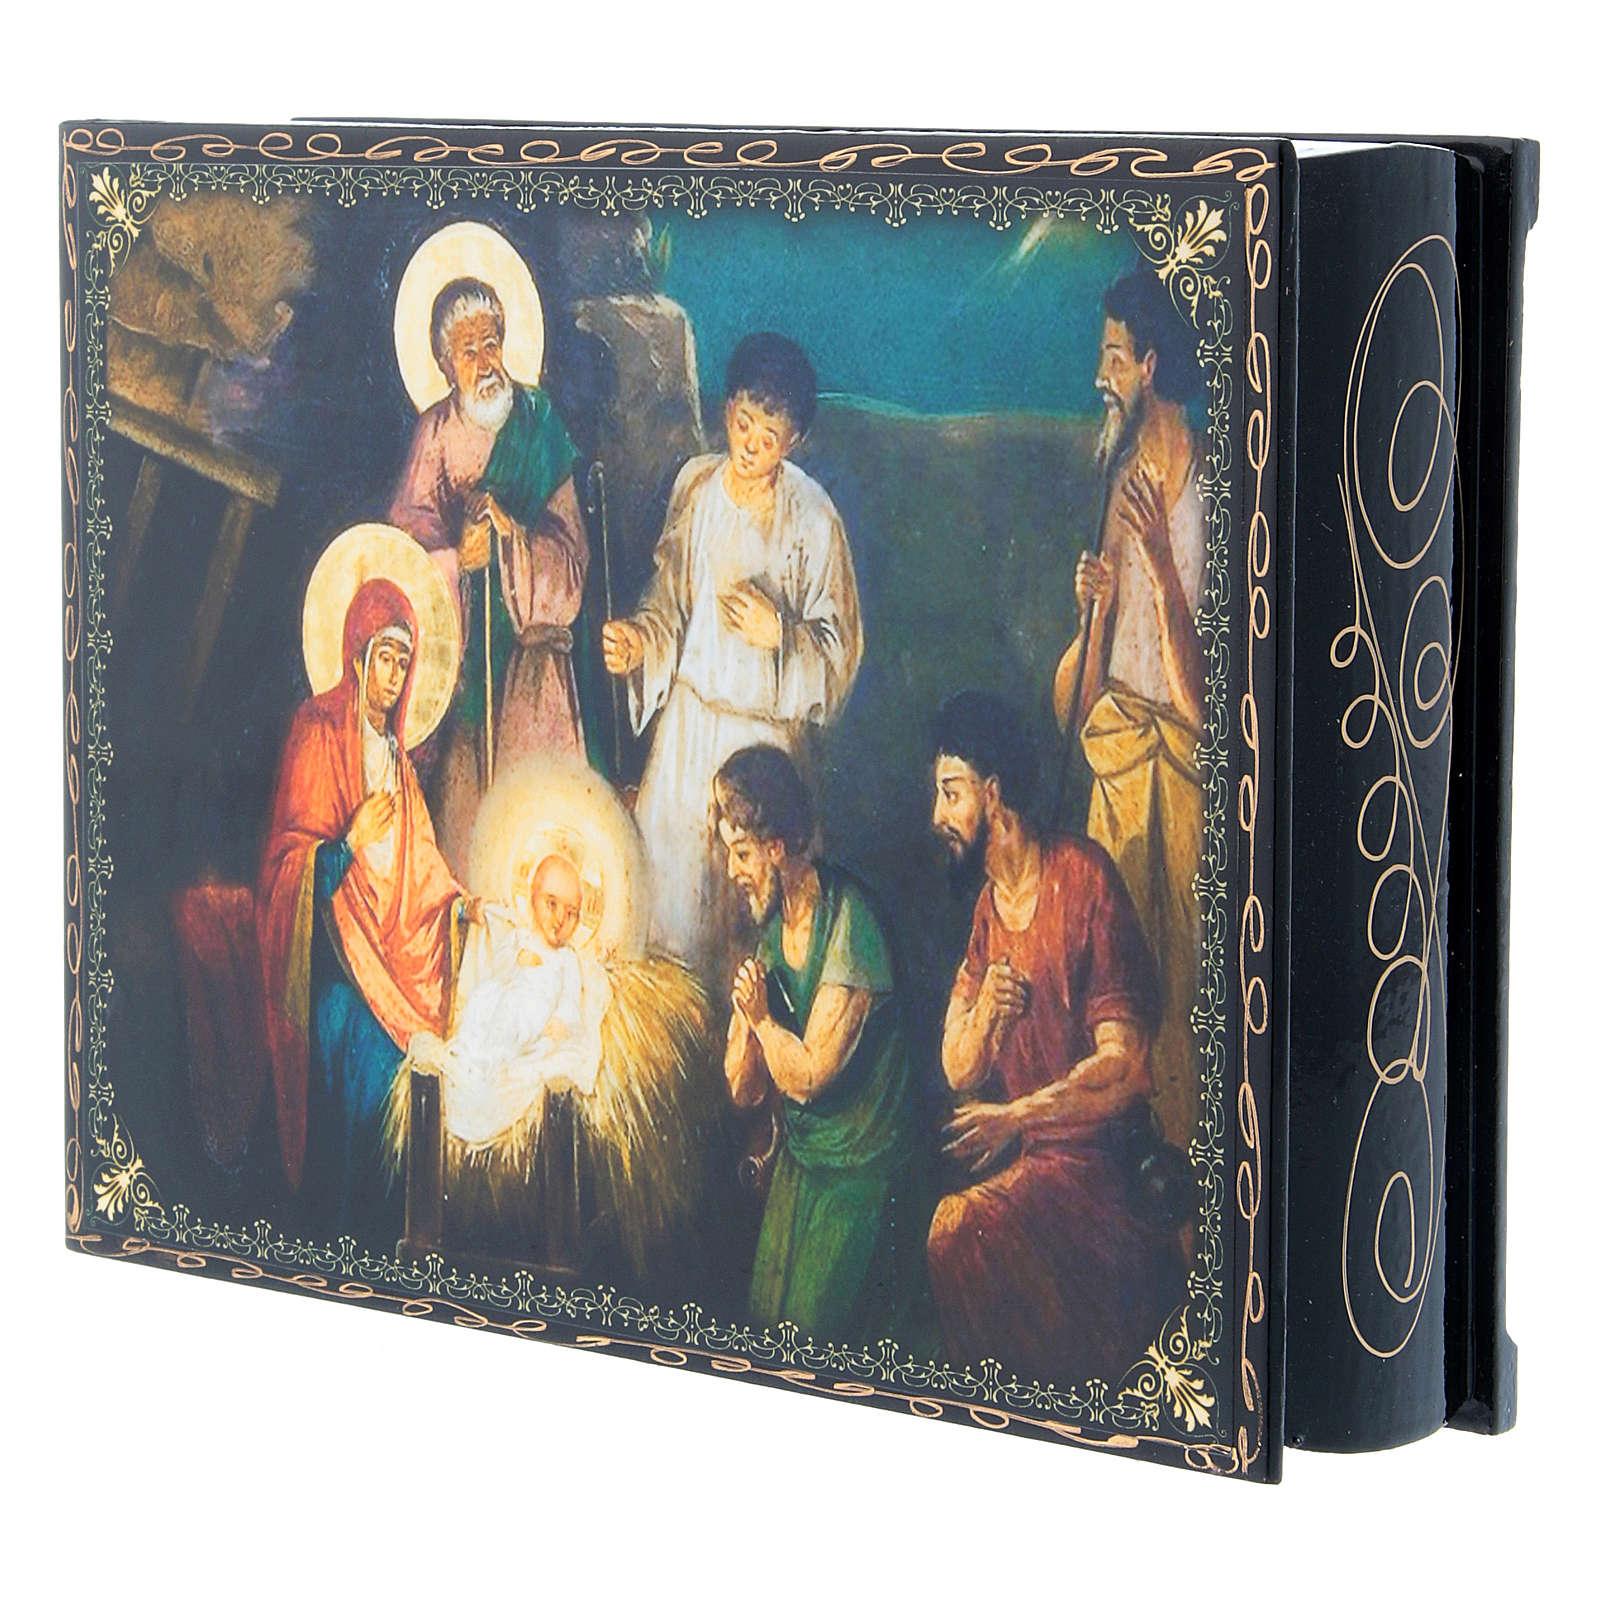 Russian papier-machè and lacquer box The Birth of Jesus Christ 22X16 cm 4